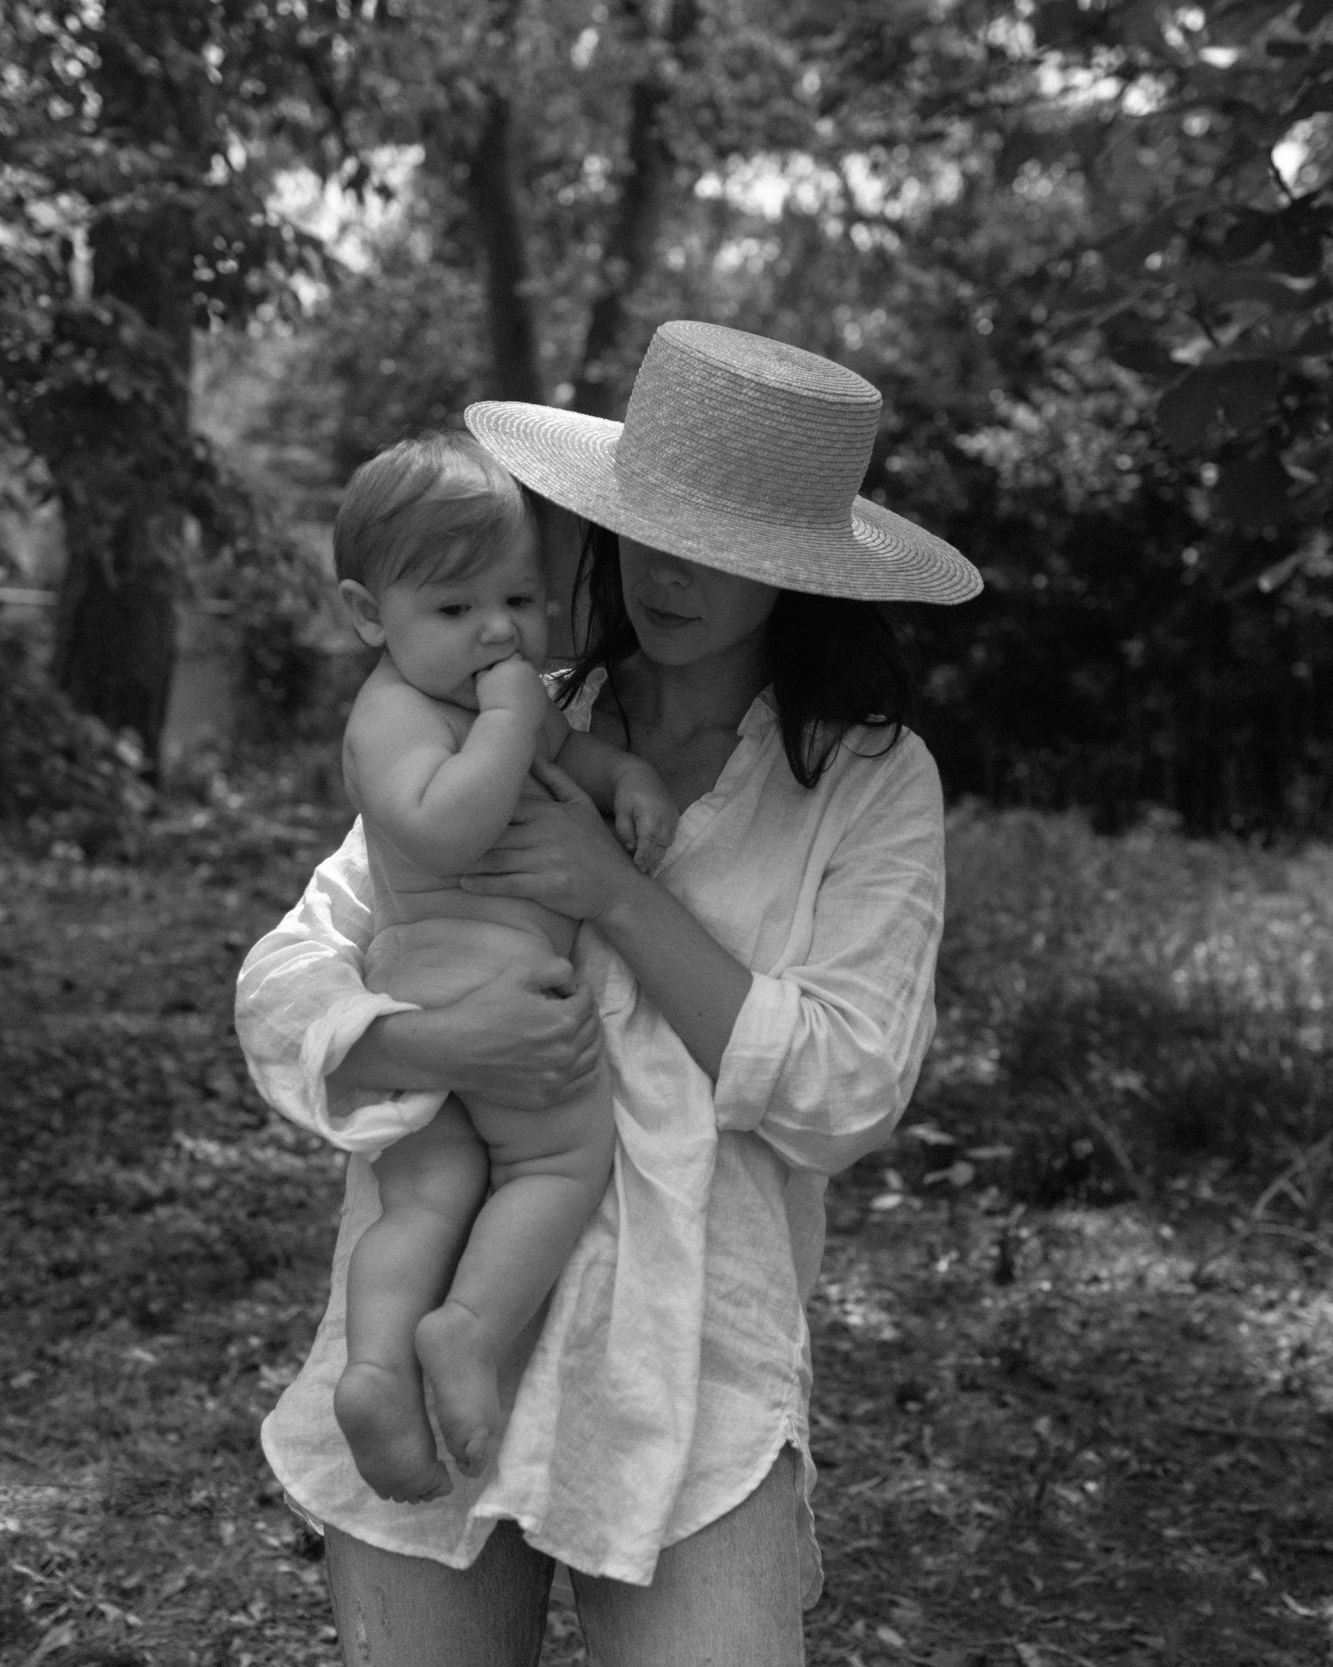 MothersDay-HughandMe-Anna-Howard-8.jpg